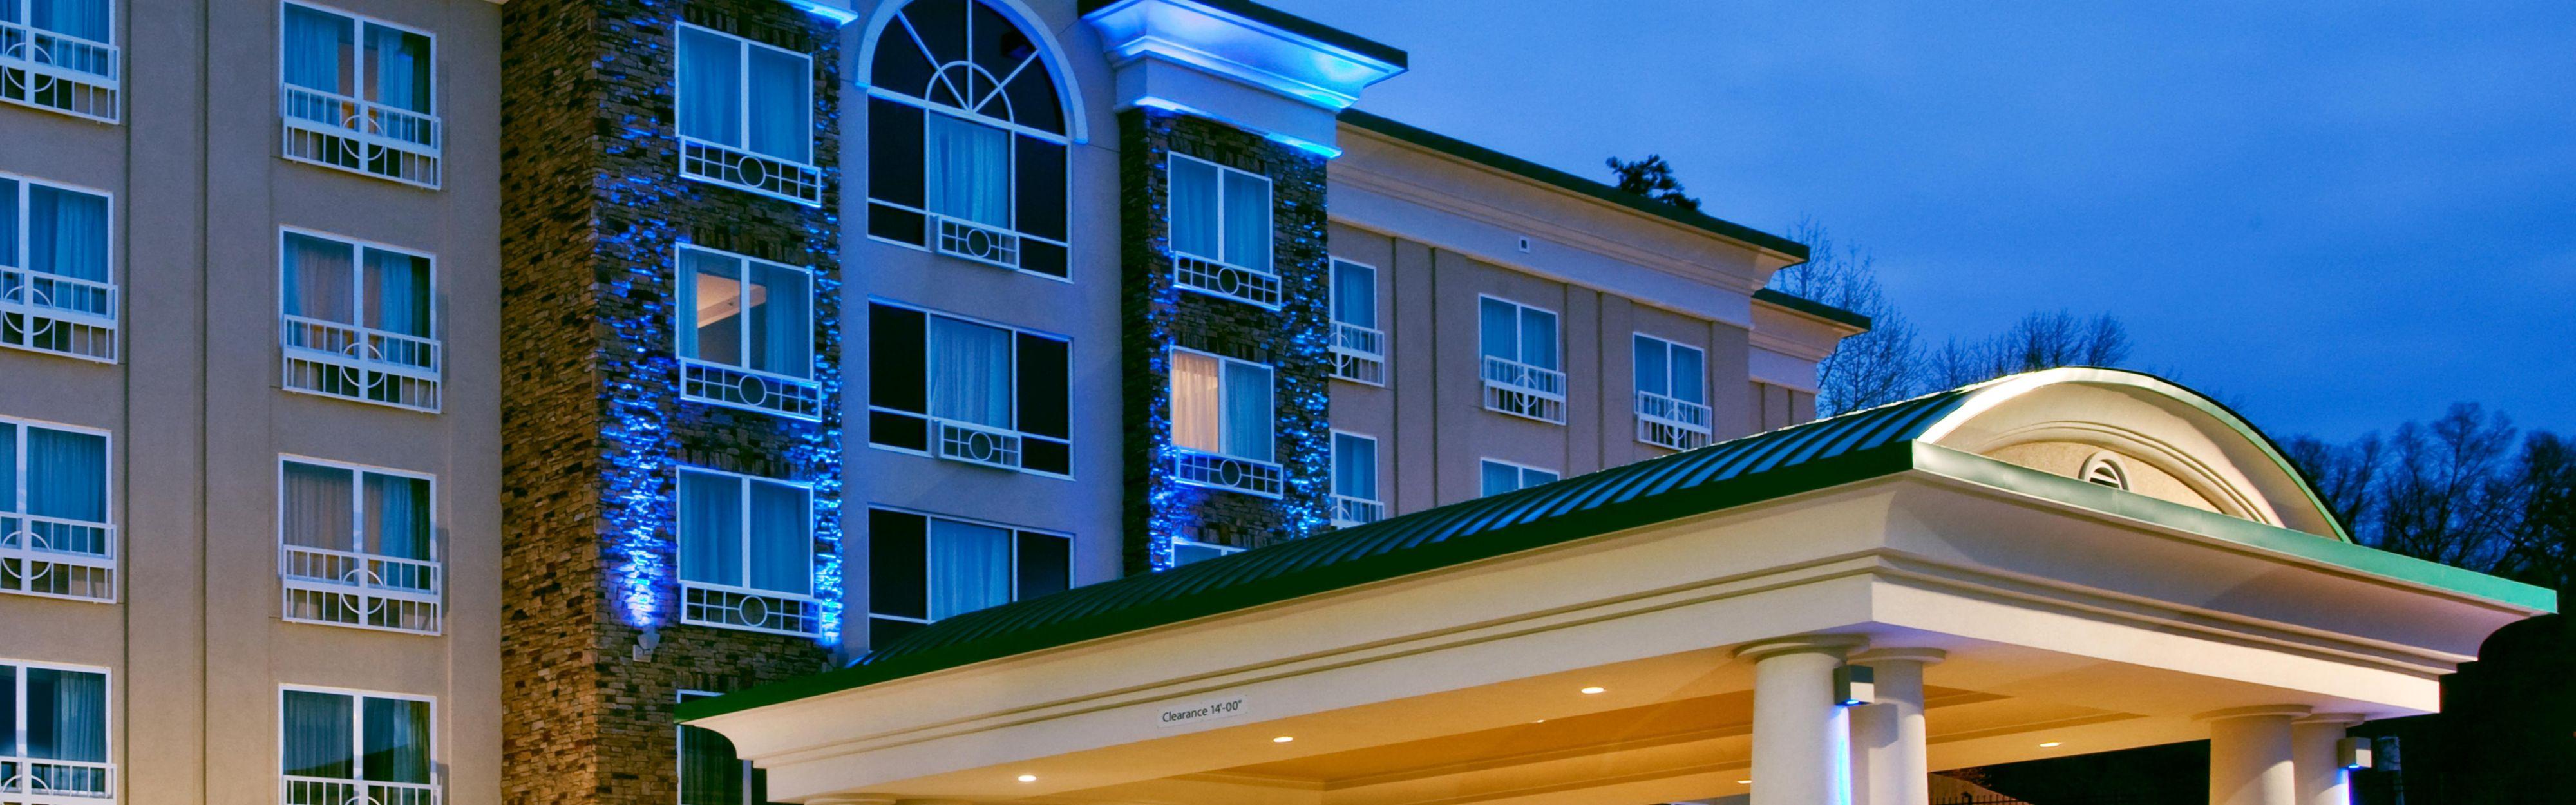 Holiday Inn Express & Suites Columbus-Fort Benning image 0